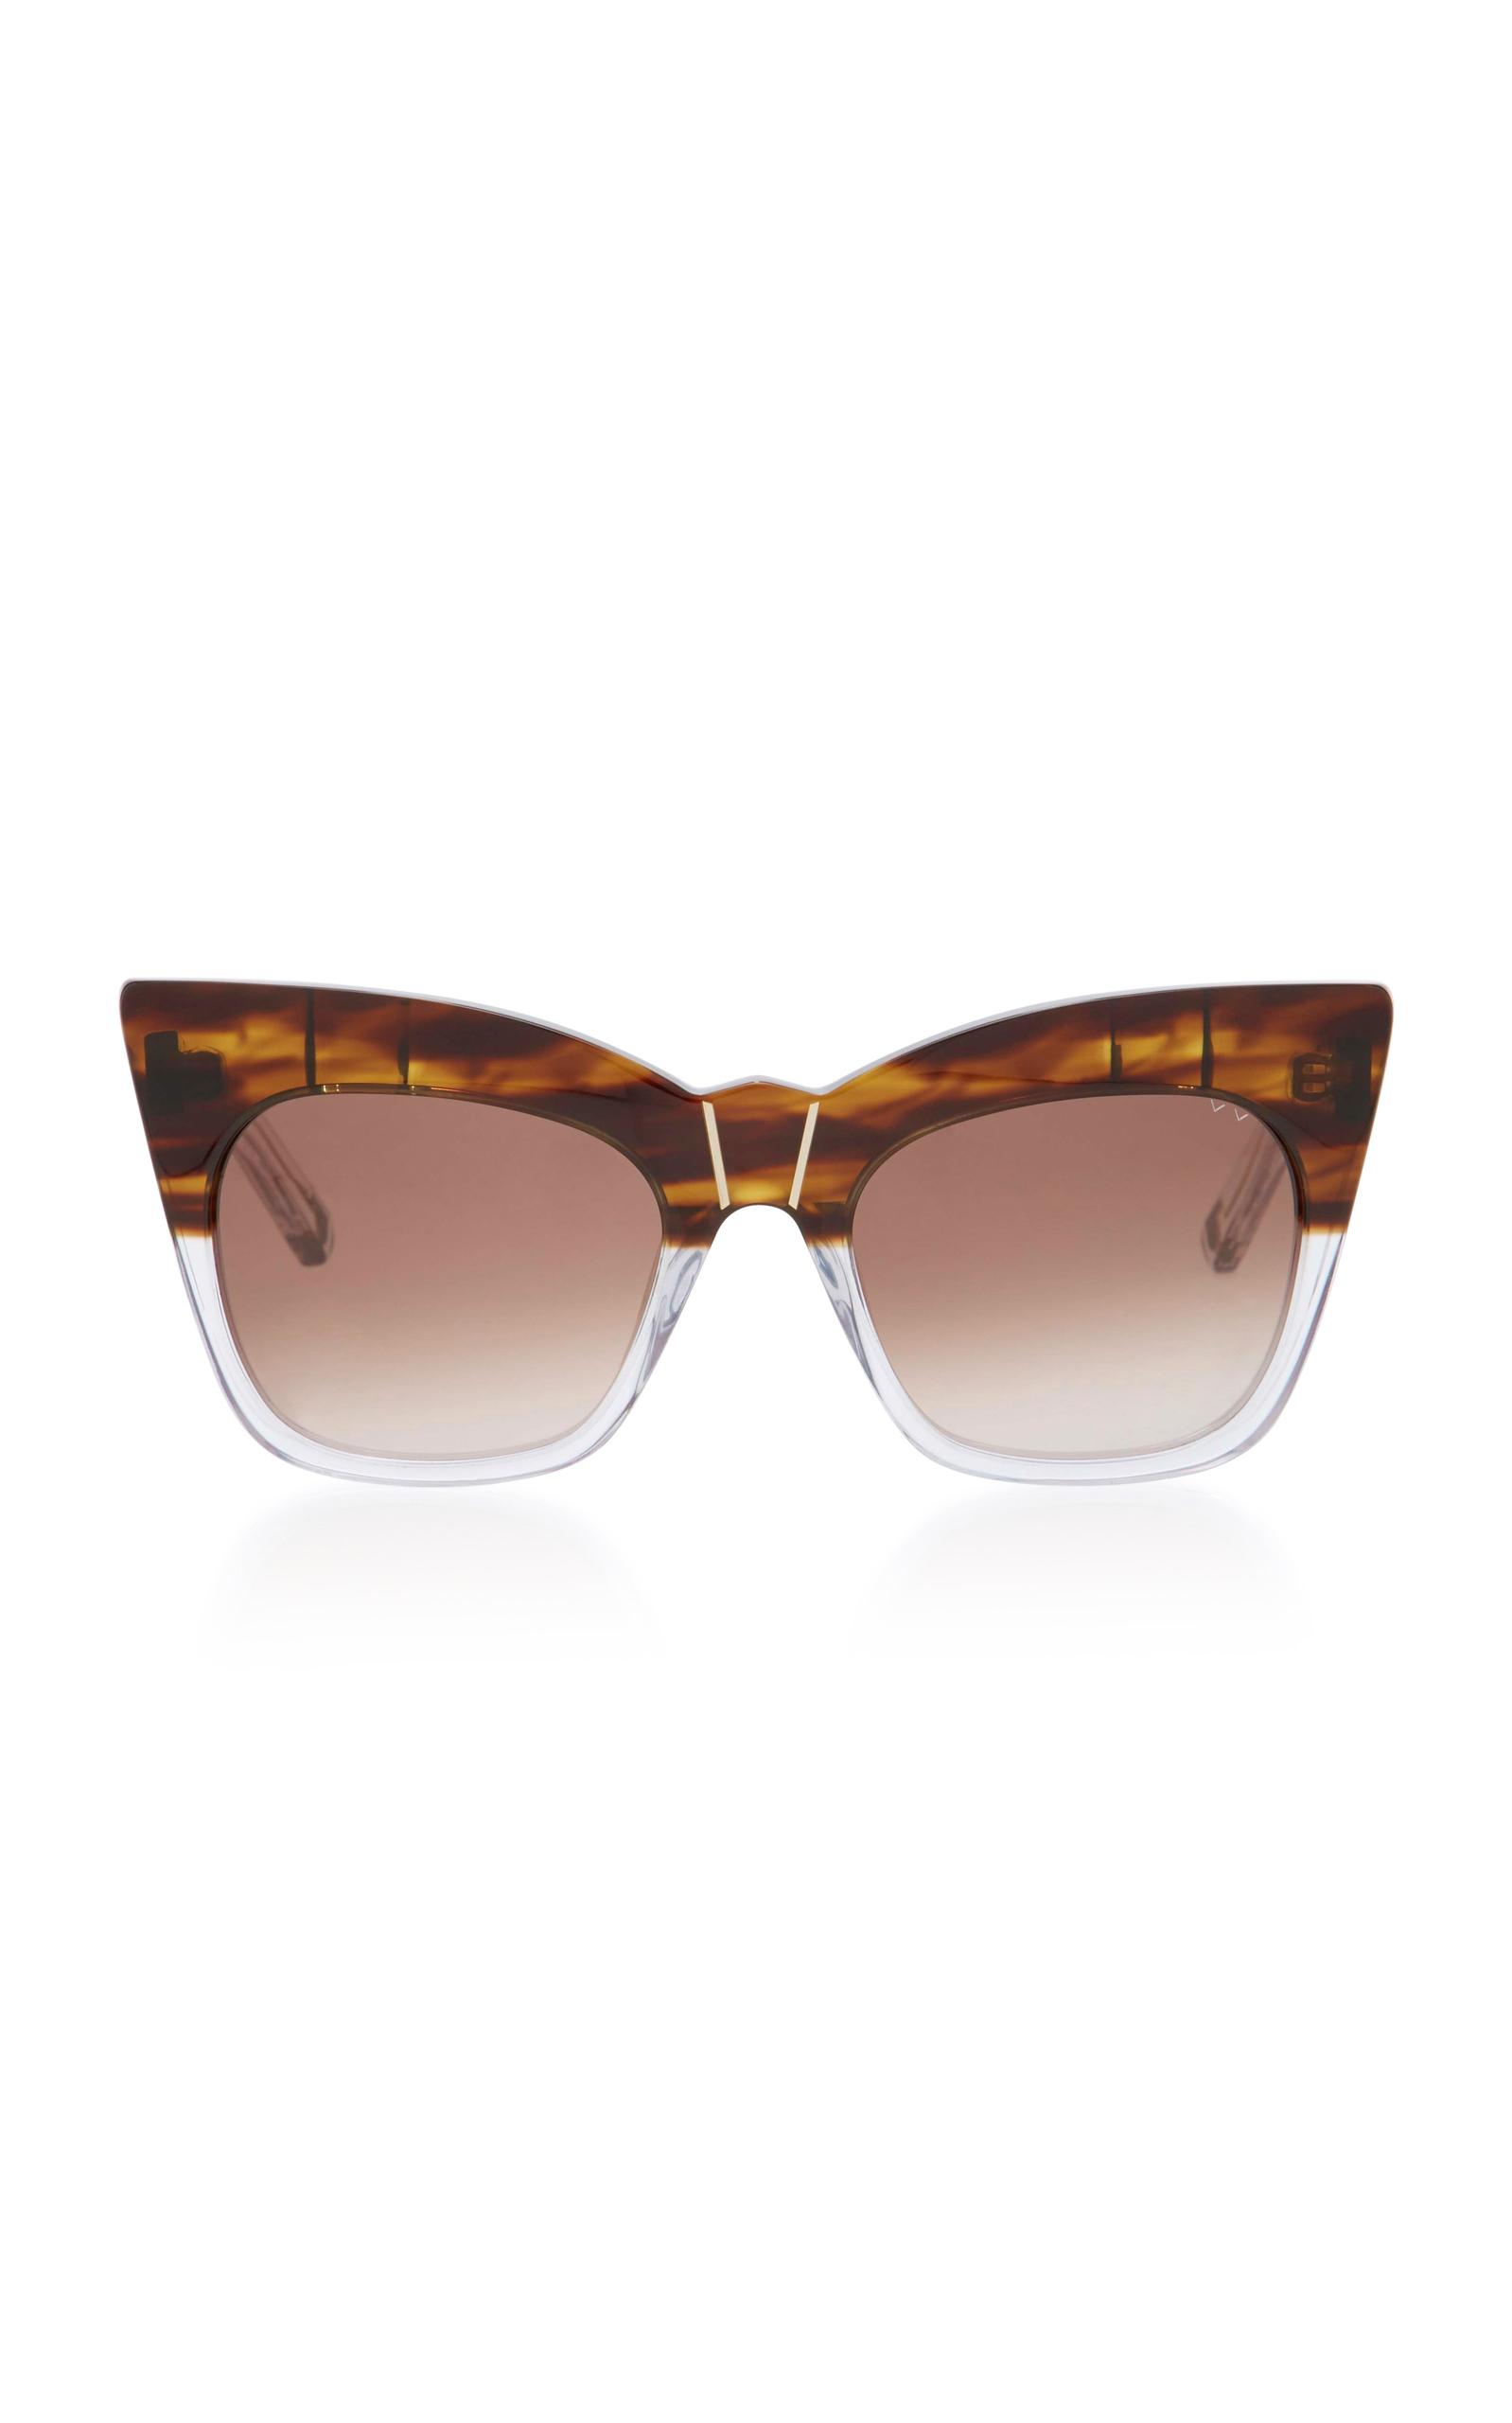 PARED EYEWEAR Kohl & Kaftans Two-Tone Cat-Eye Sunglasses in Brown